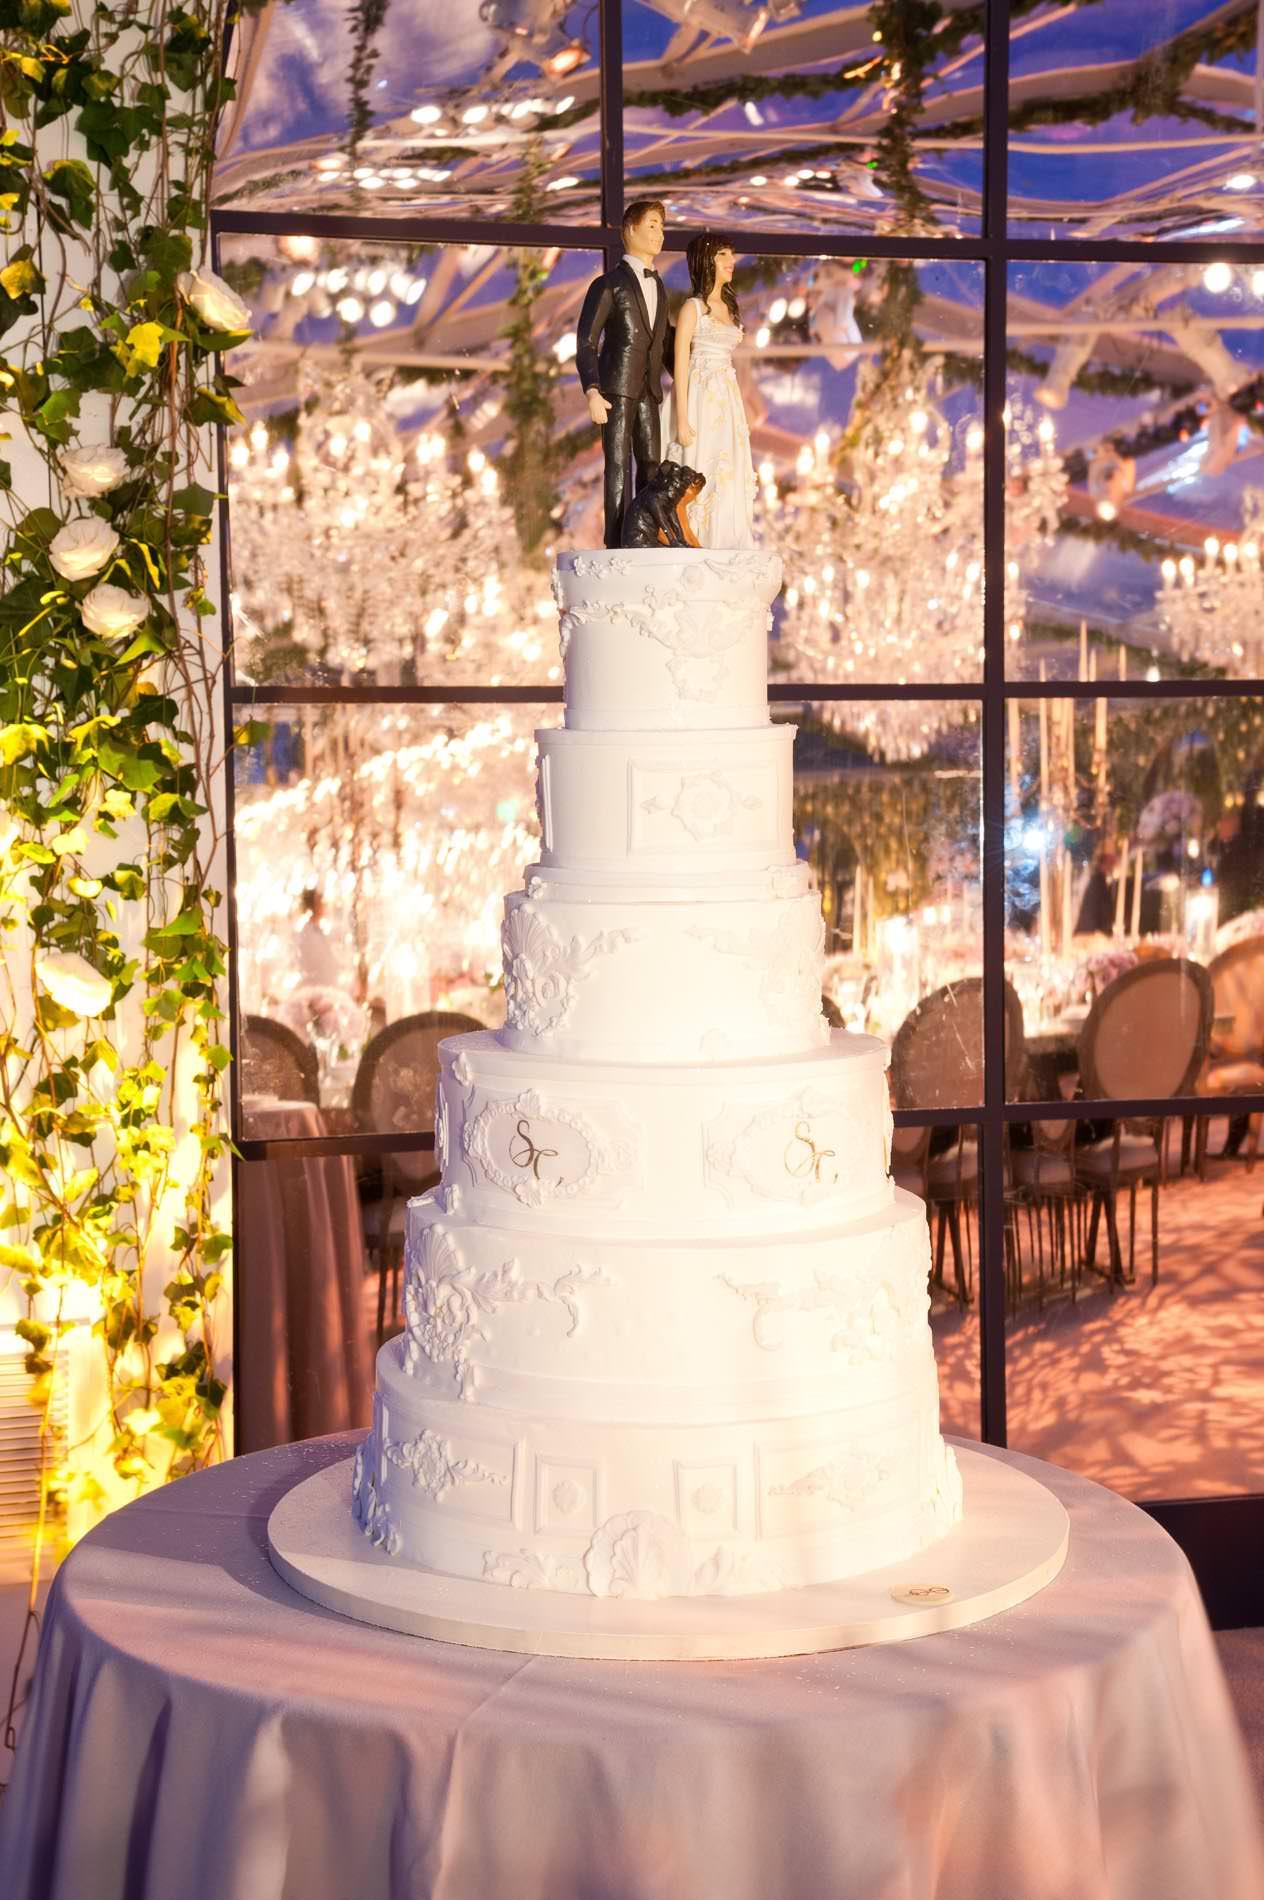 NYC Cake Designers: Sylvia Weinstock